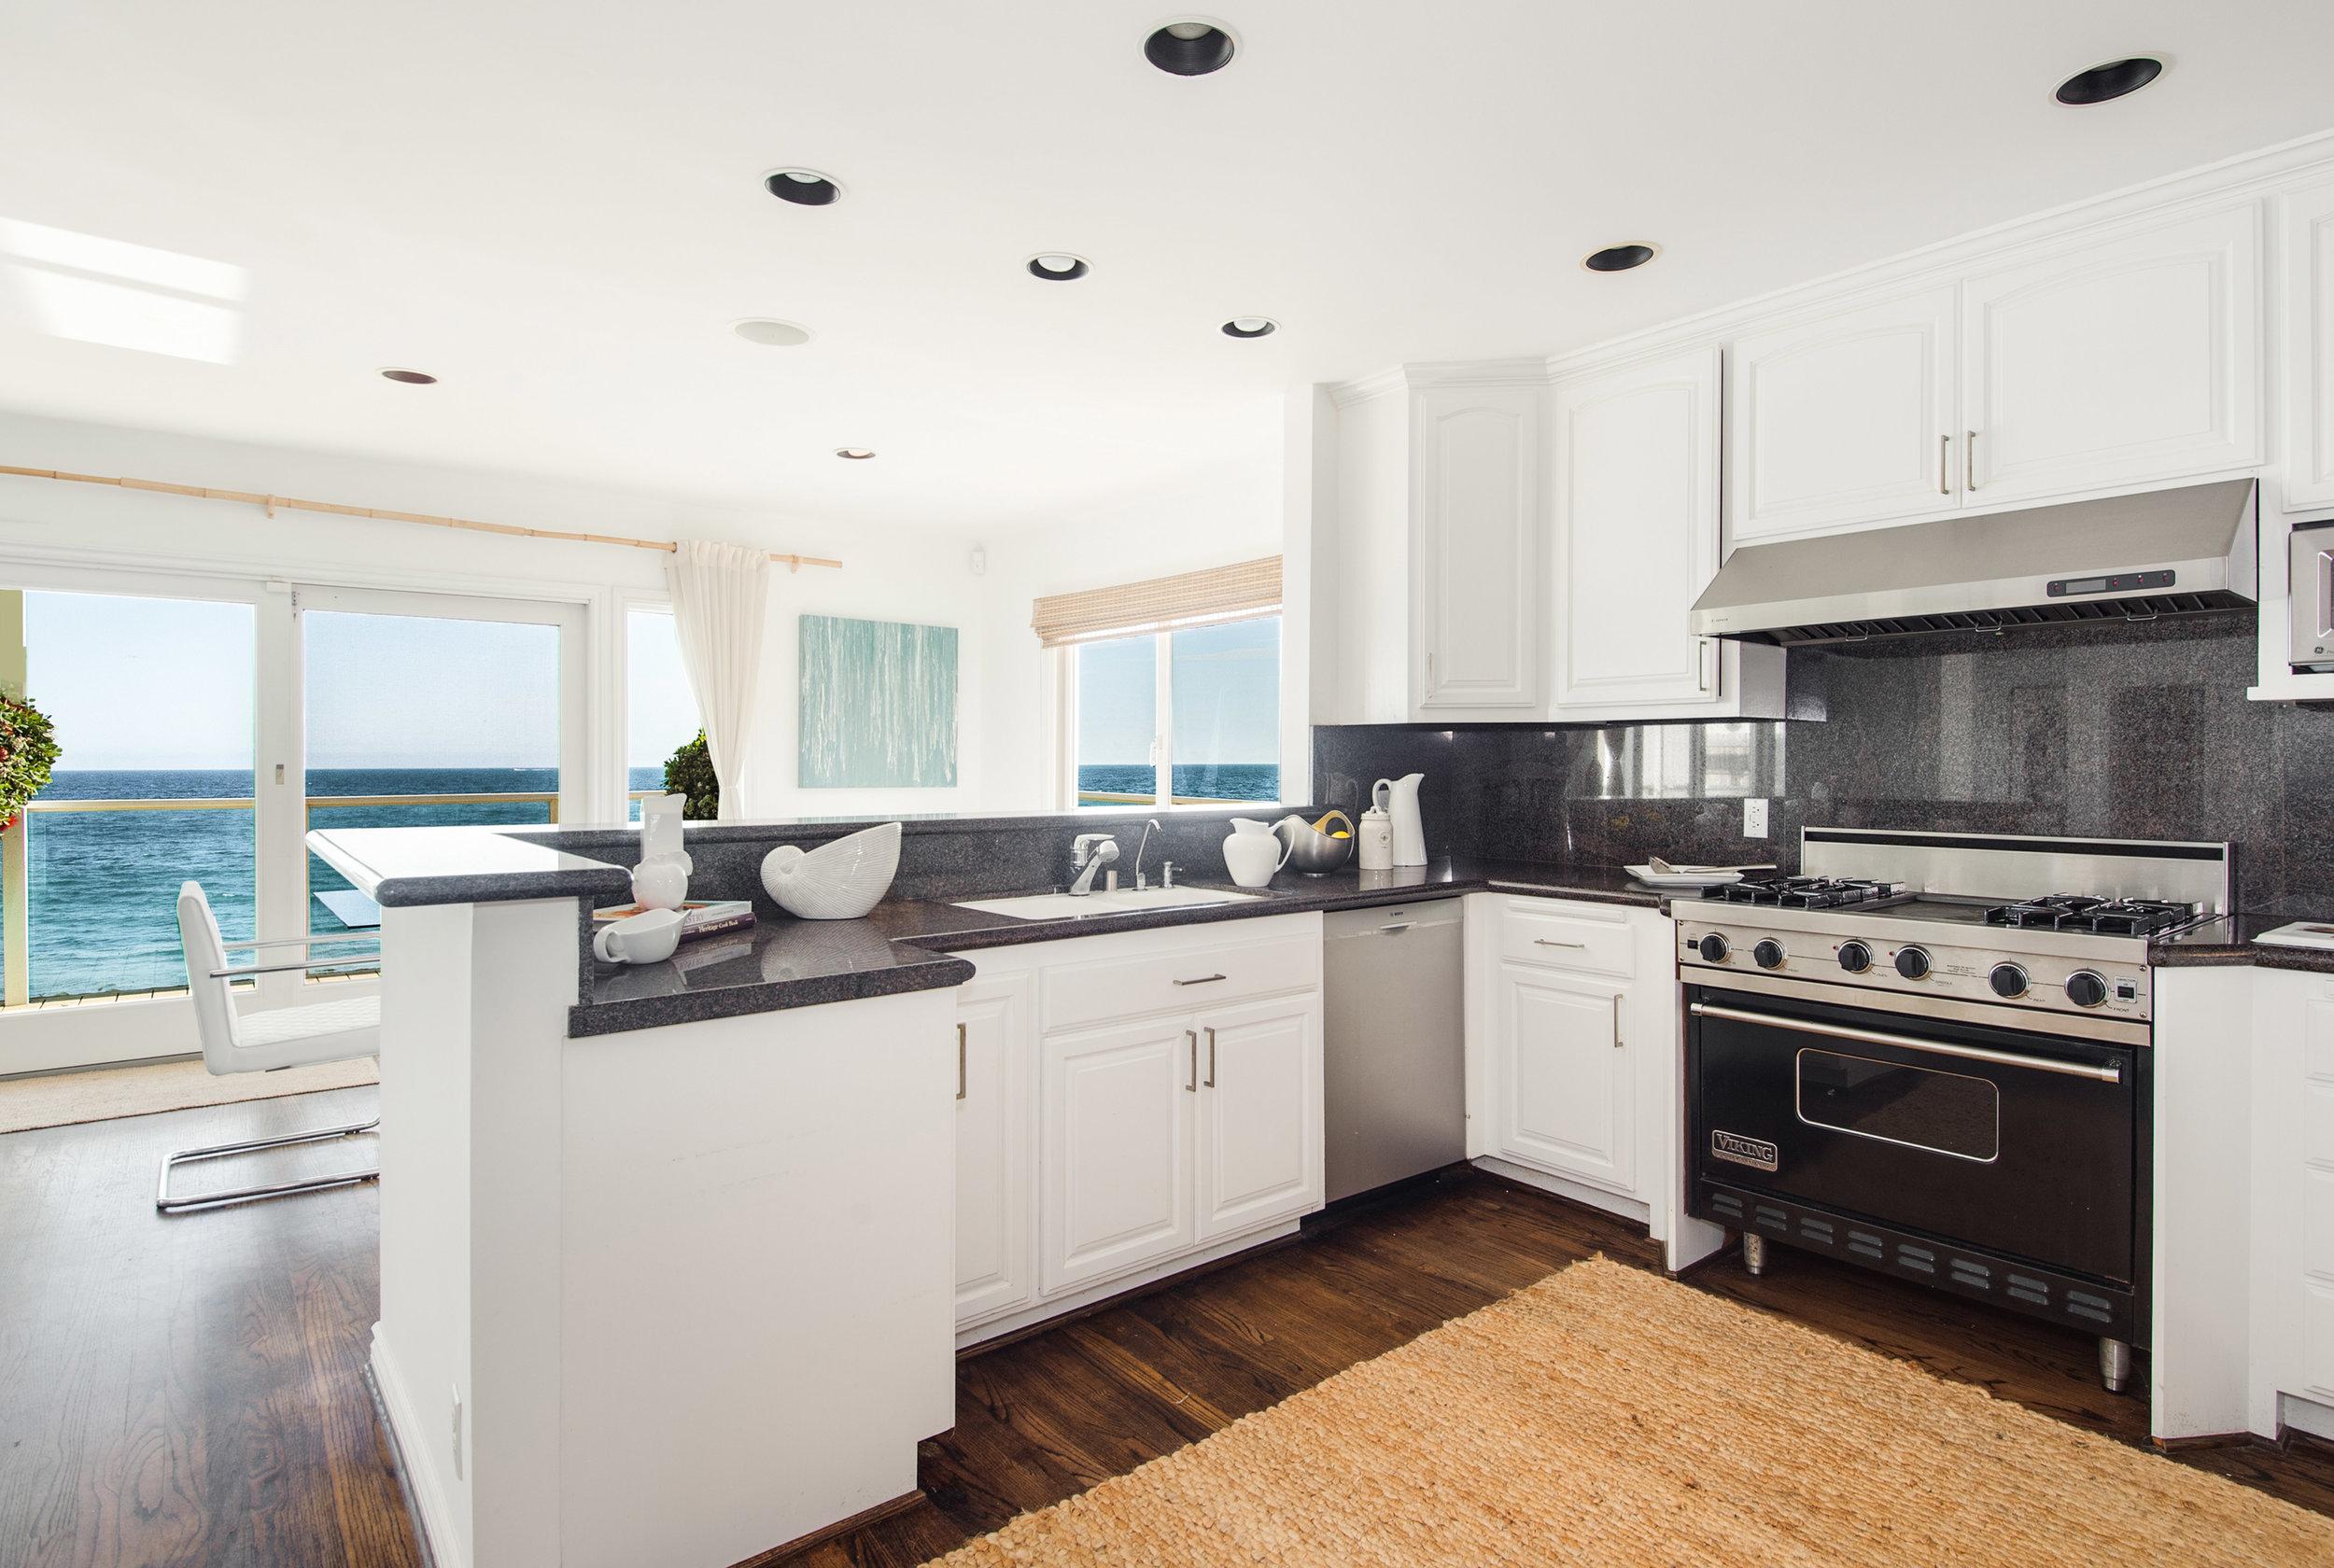 012 Kitchen 25342 Malibu Road For Sale Lease The Malibu Life Team Luxury Real Estate.jpg